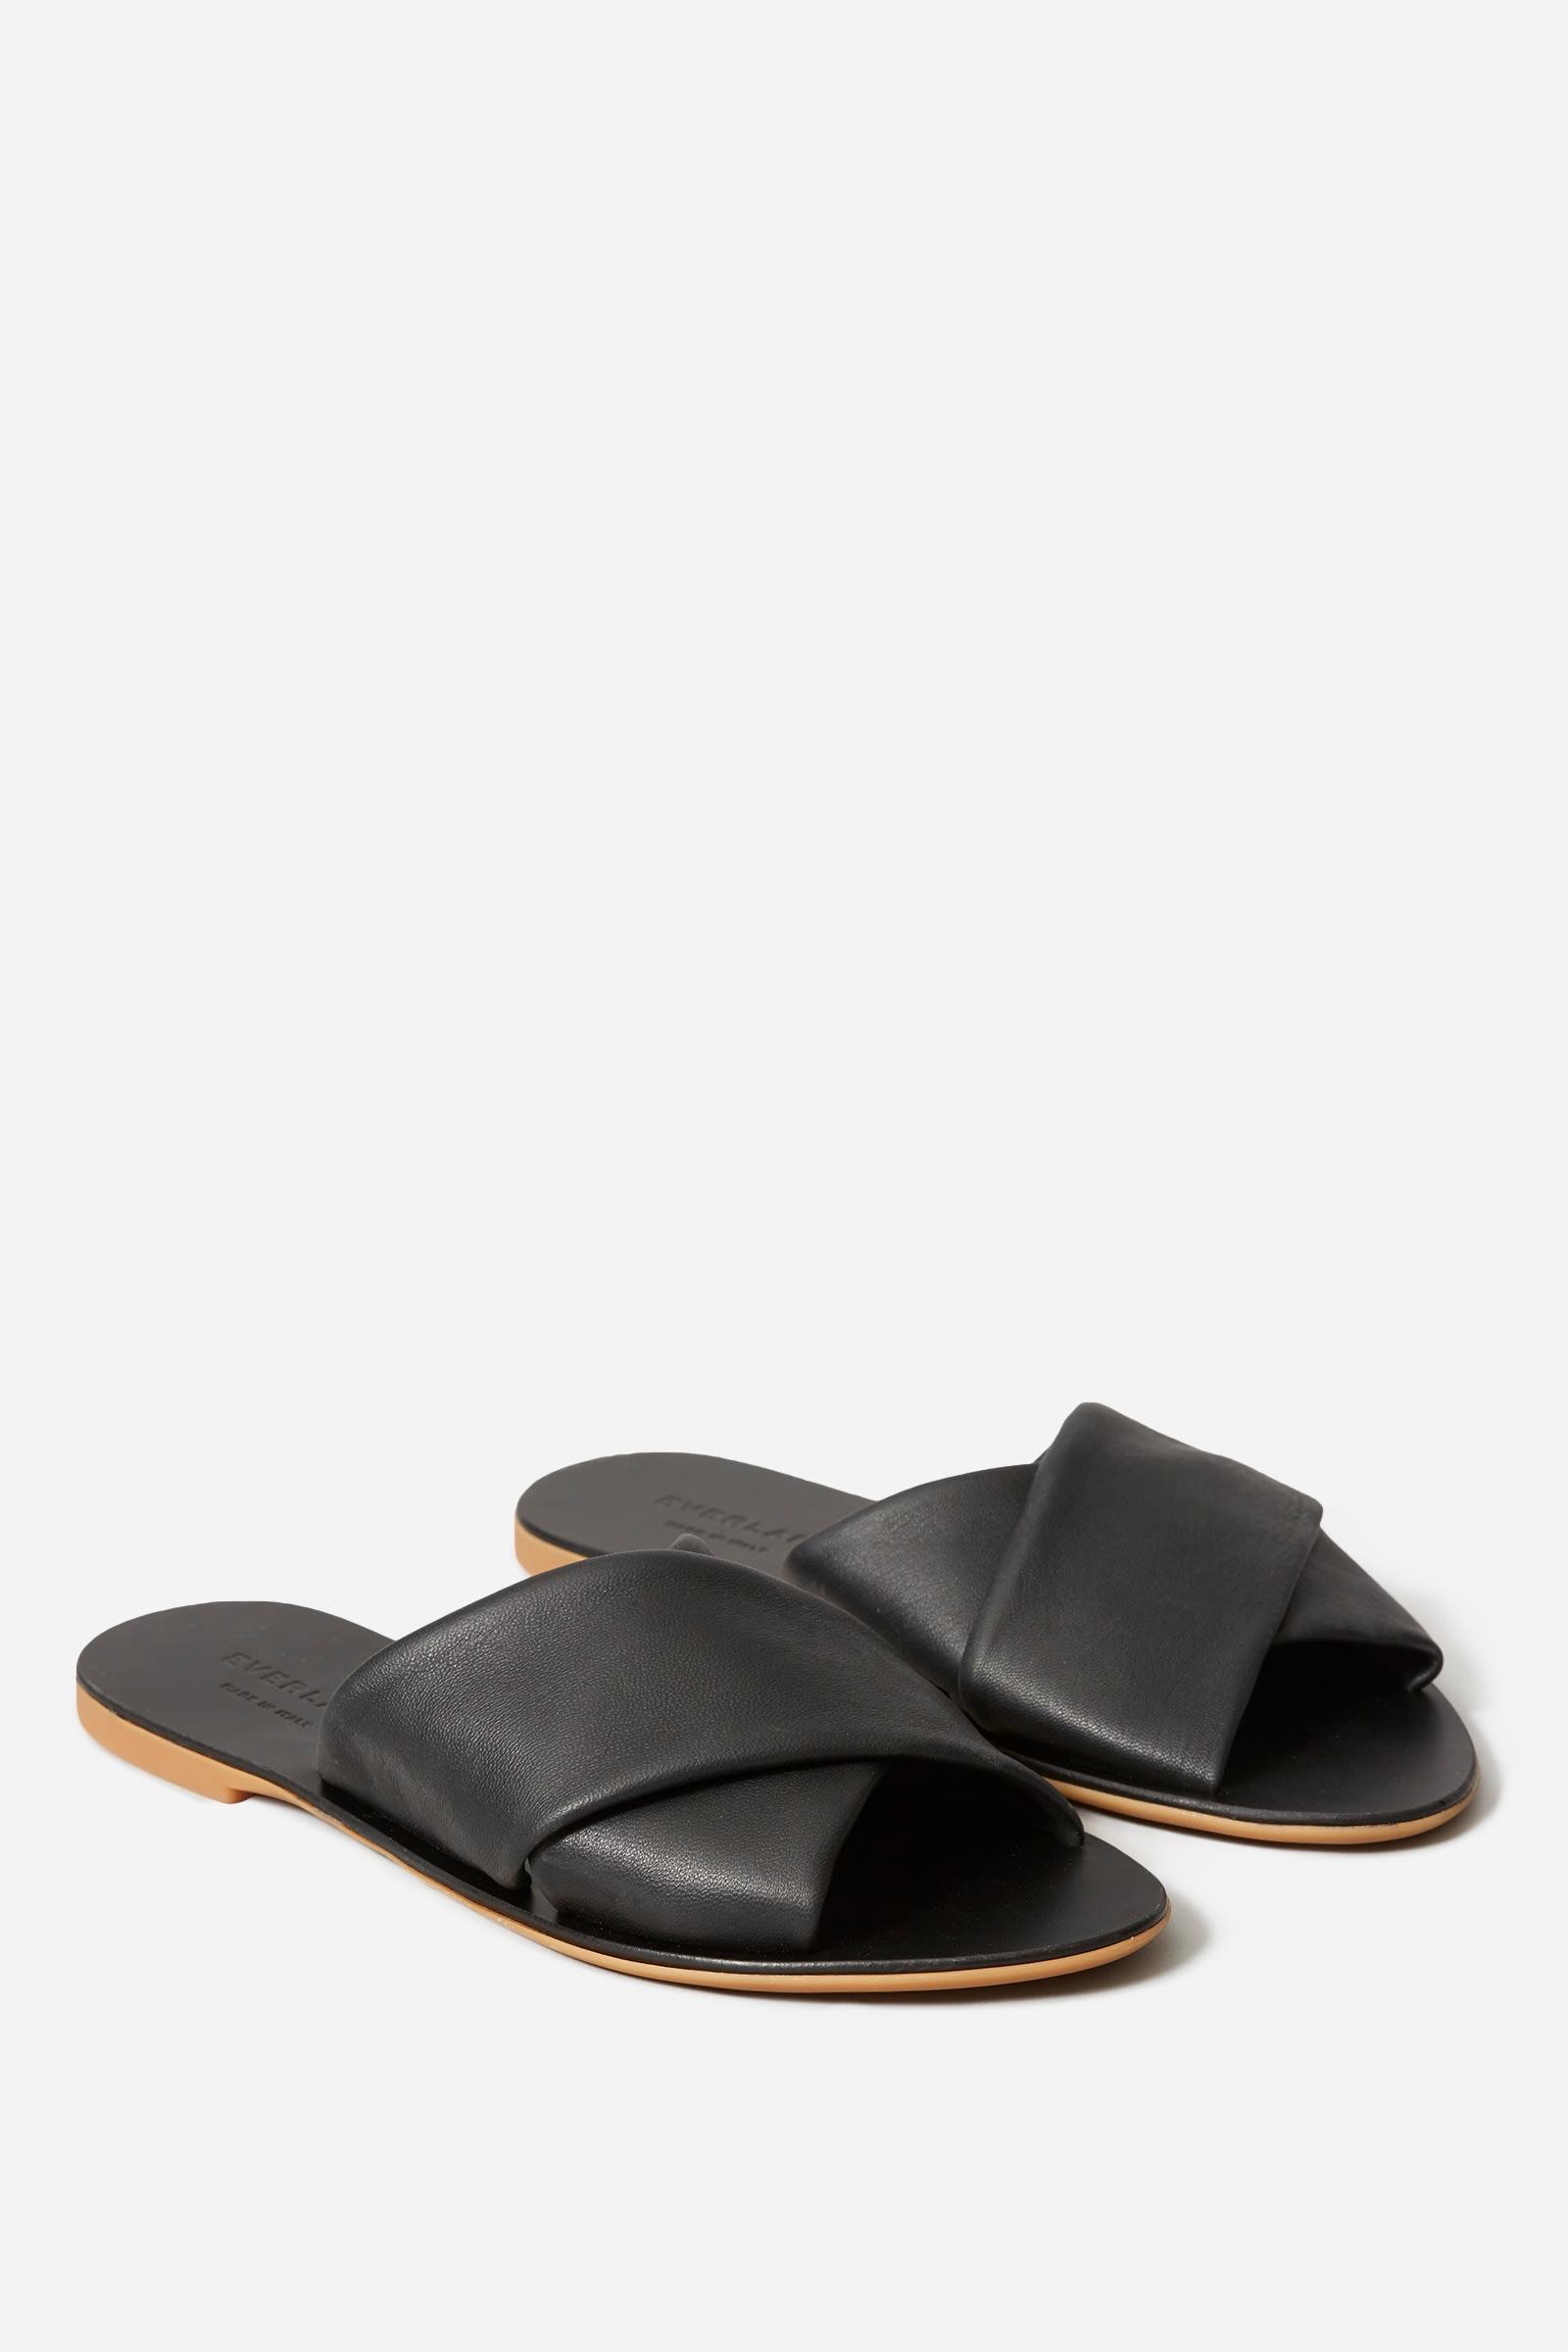 Crossover Sandals, $88, Everlane